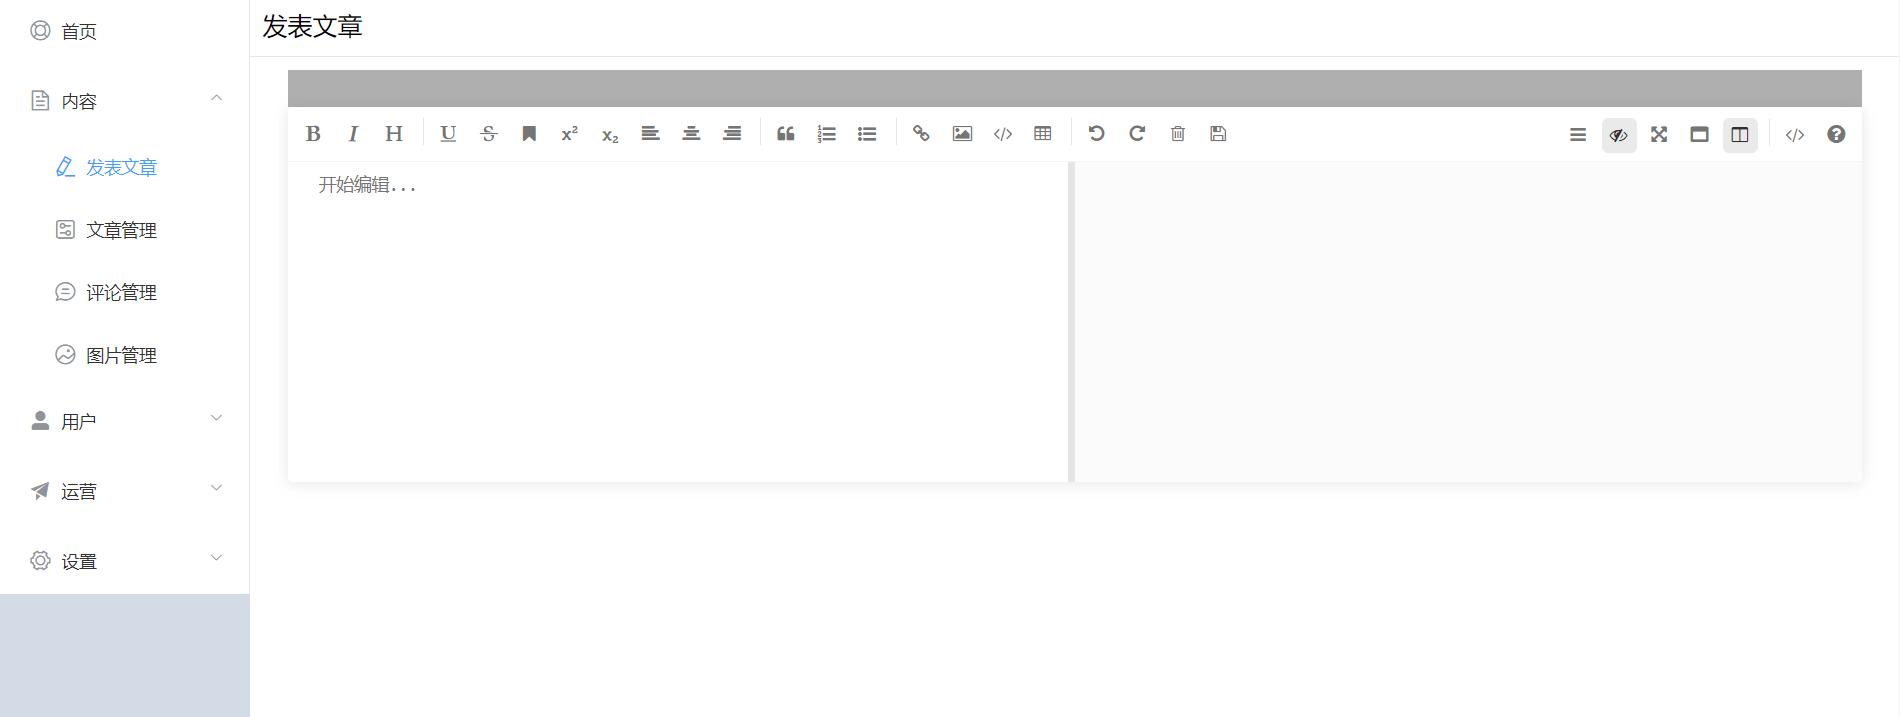 vue+element-ui集成mavonEditor编辑器